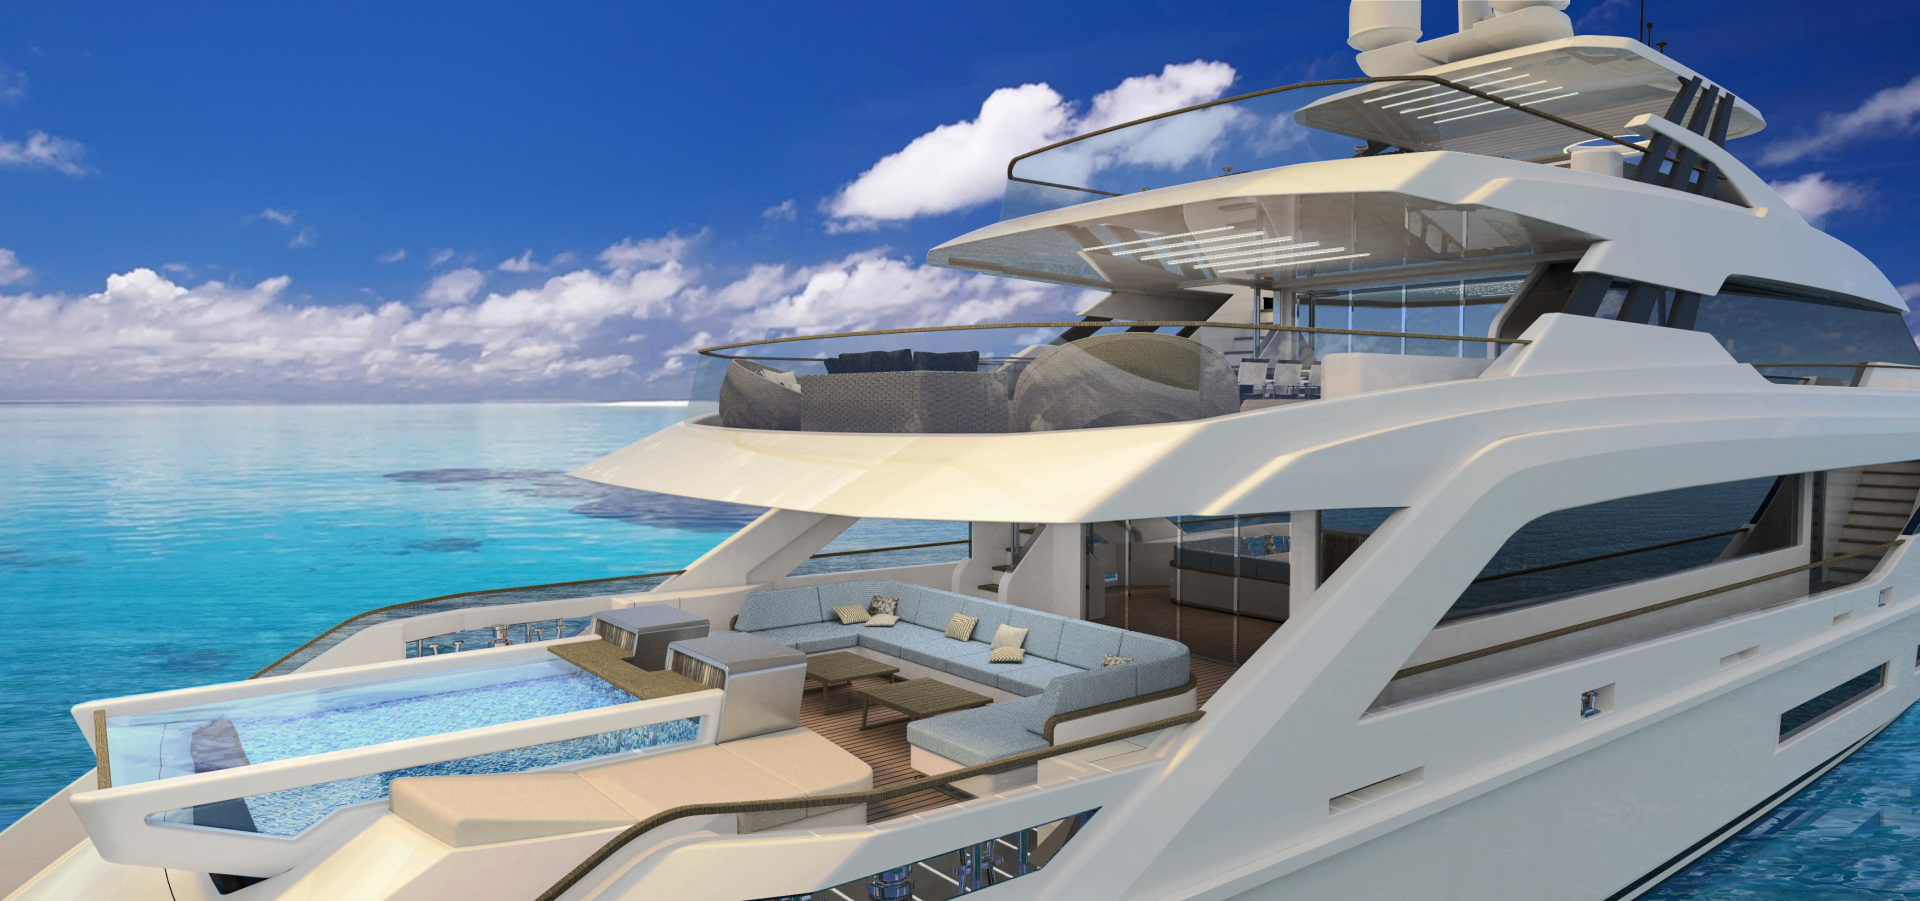 GHI Yachts 2023-THUNDERBIRD 165 Korea, Republic of-1337230 | Thumbnail